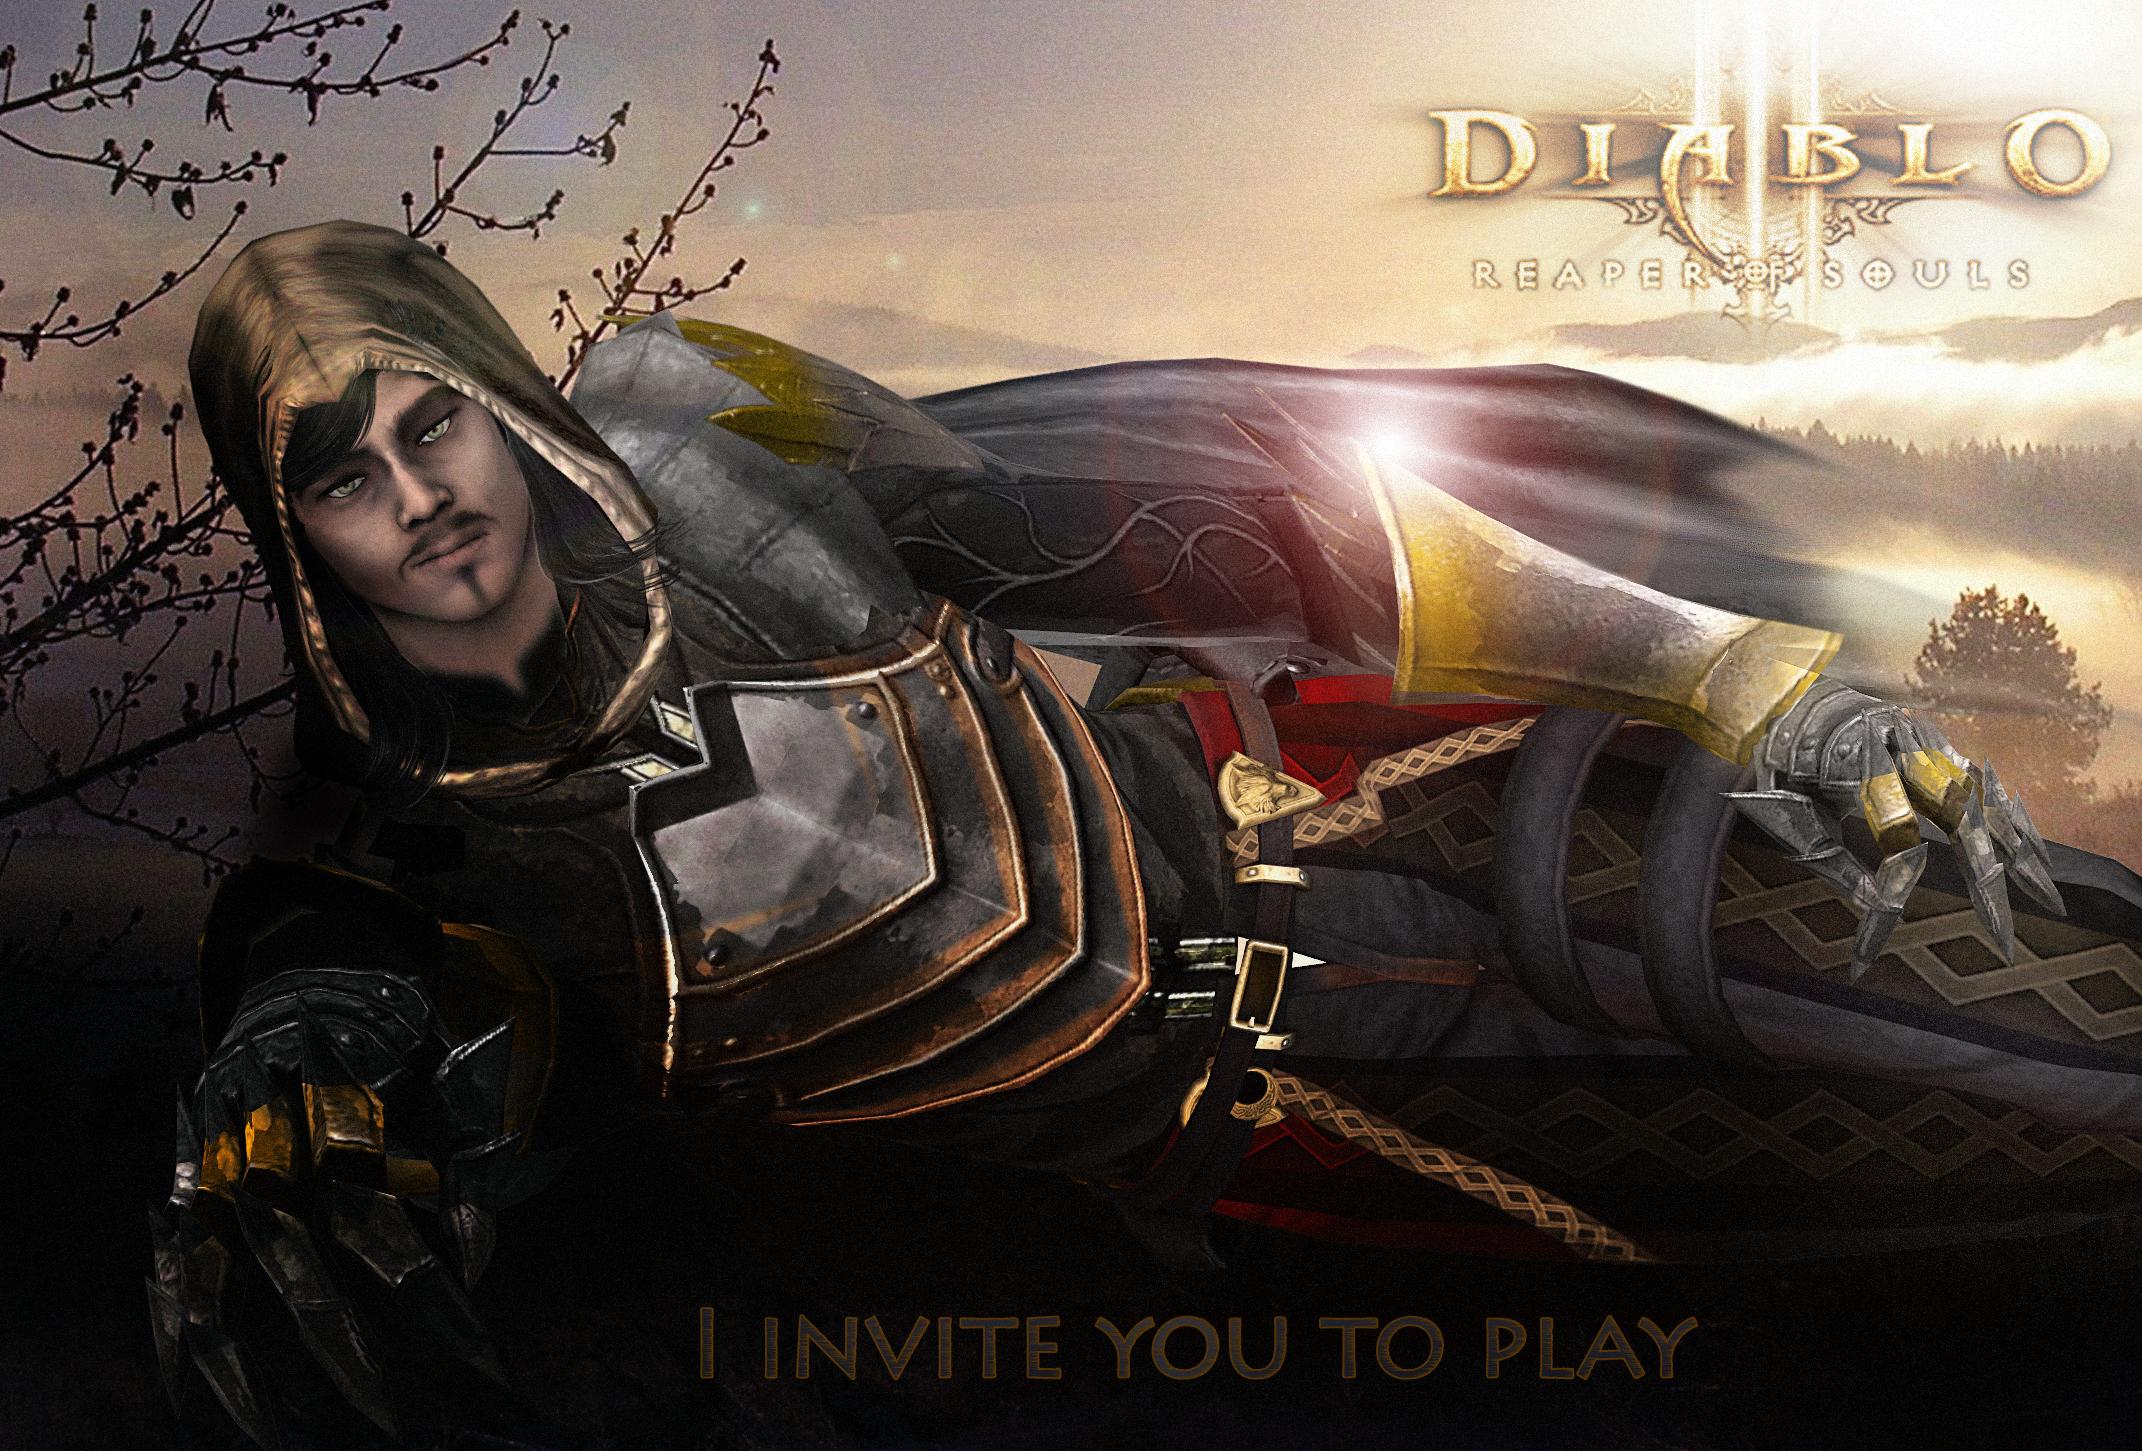 Diablo 3 Ros Wallpaper: Demon Hunter Invites You By SovietMentality